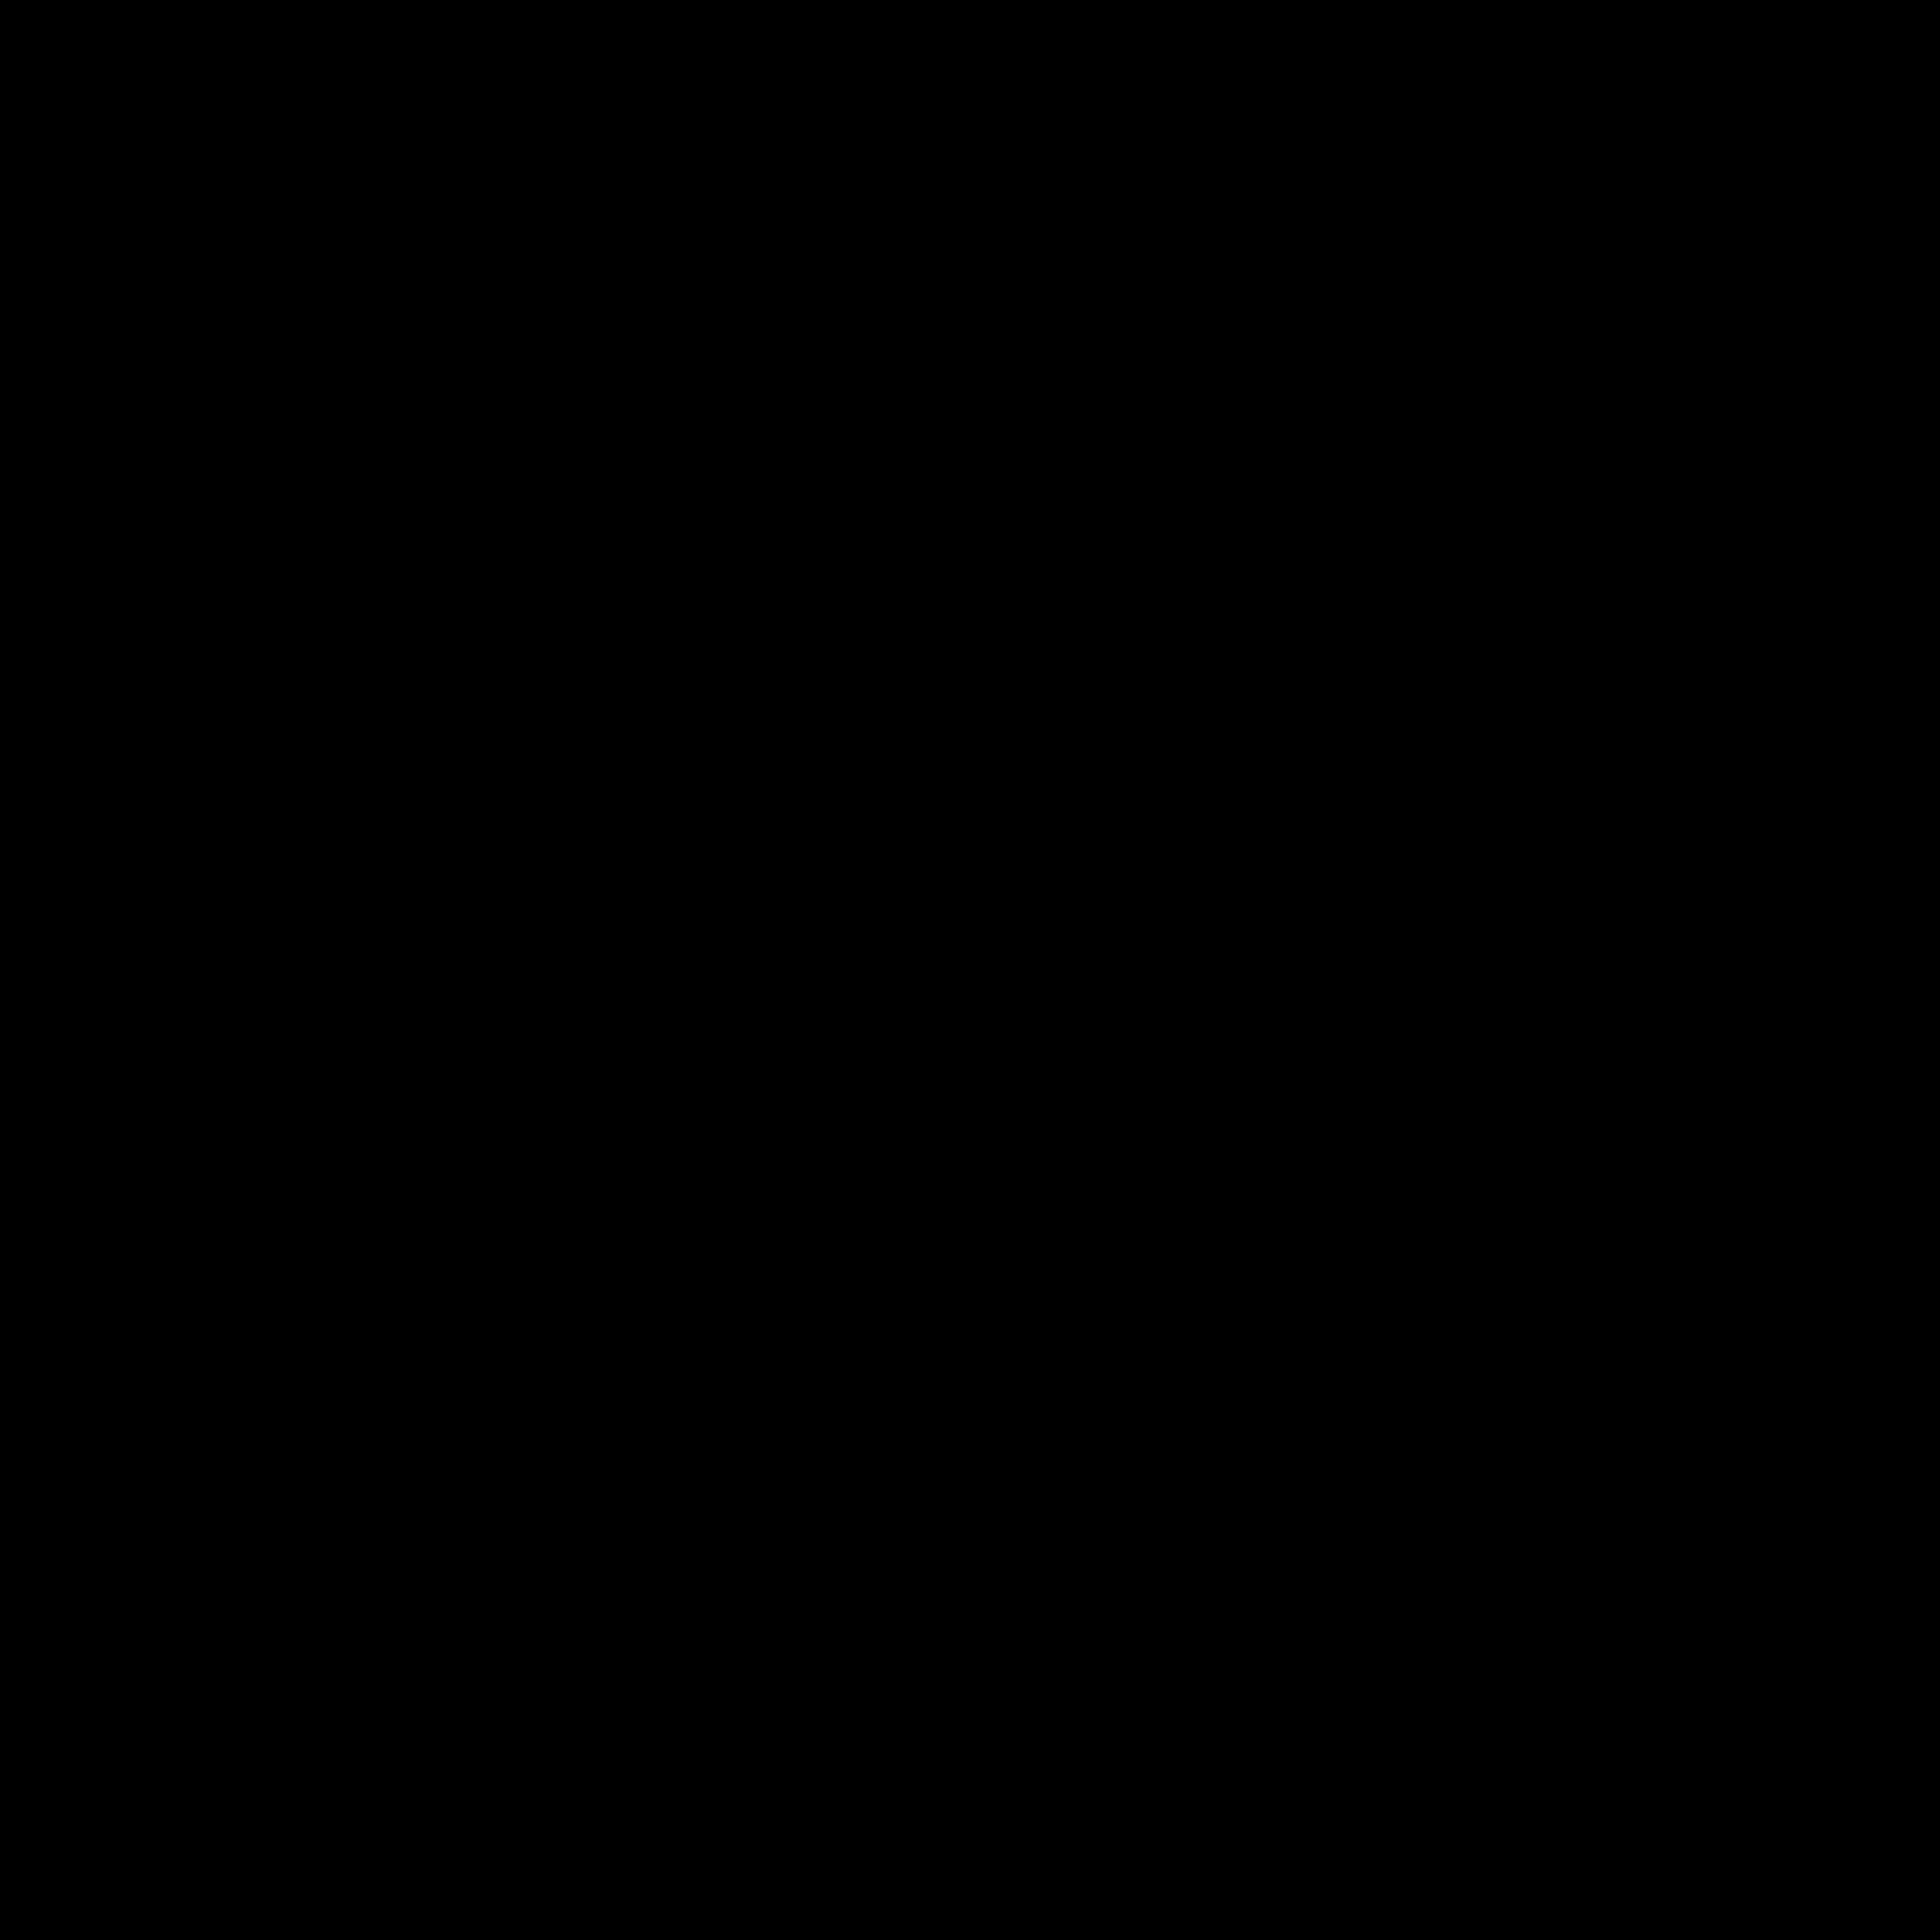 United Way Logo PNG Transparent & SVG Vector - Freebie Supply